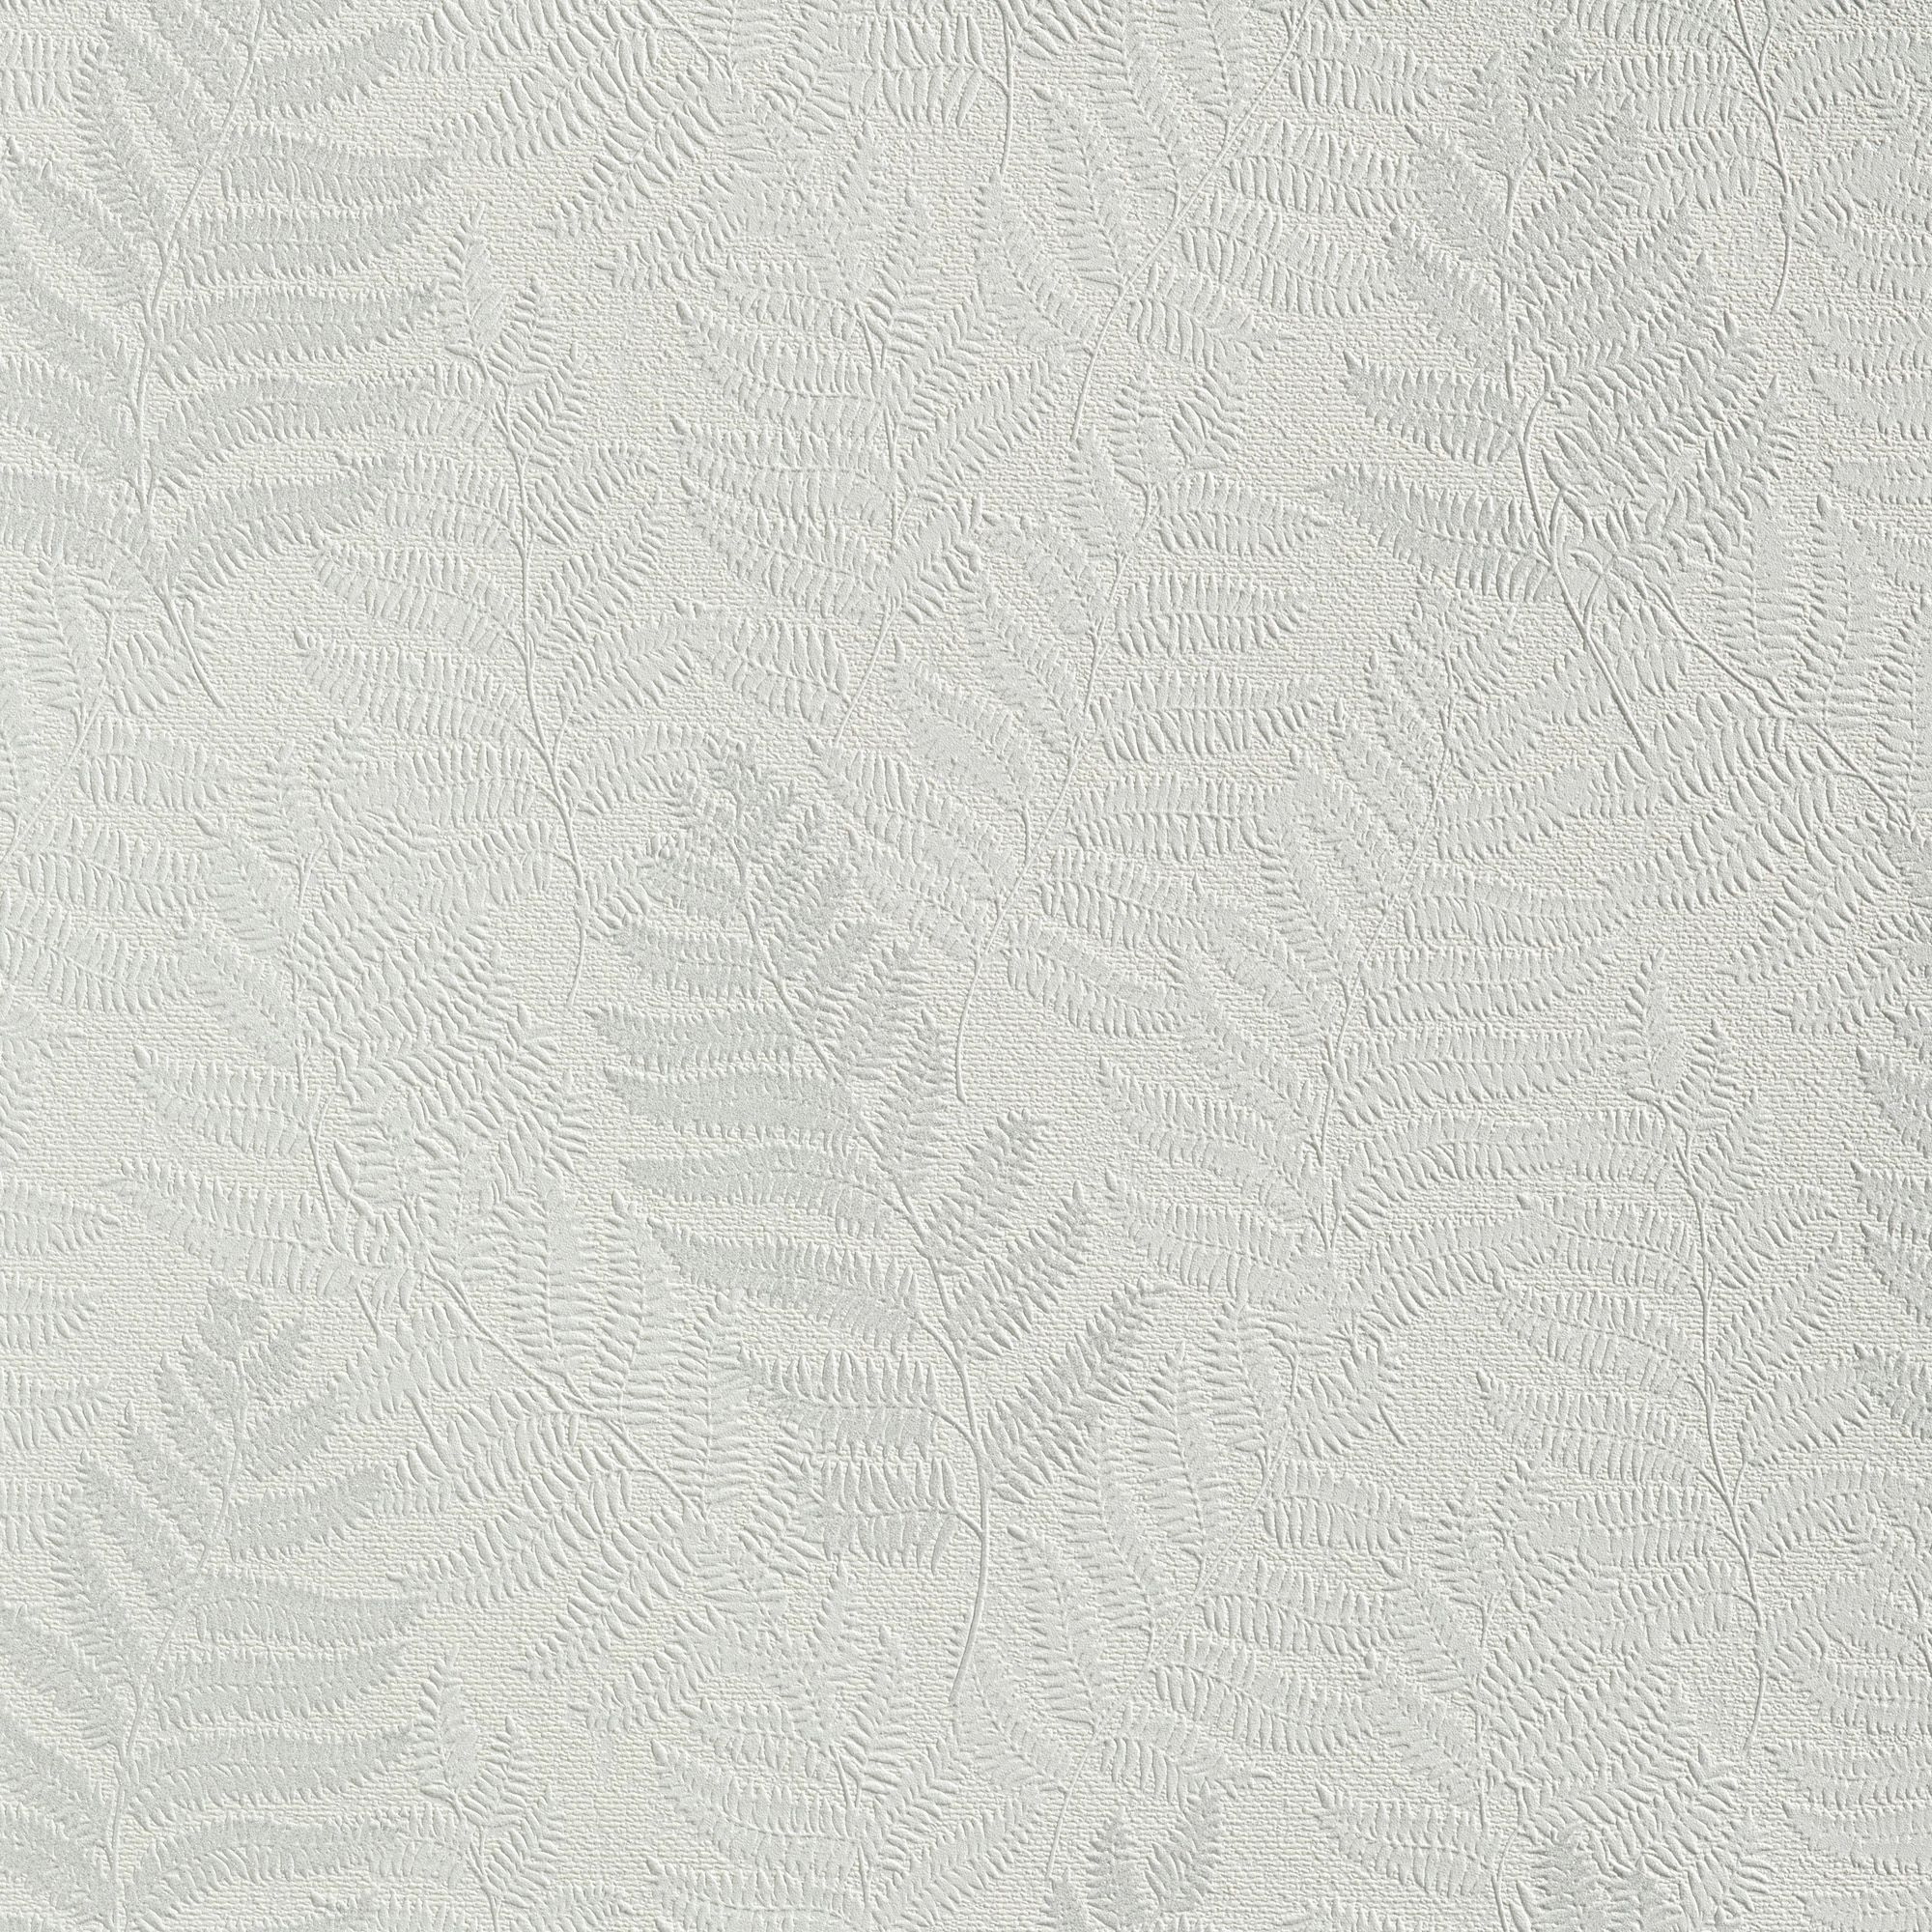 BODENMEISTER A.S. Creation Vliestapete Amory Blumenranke Weiß